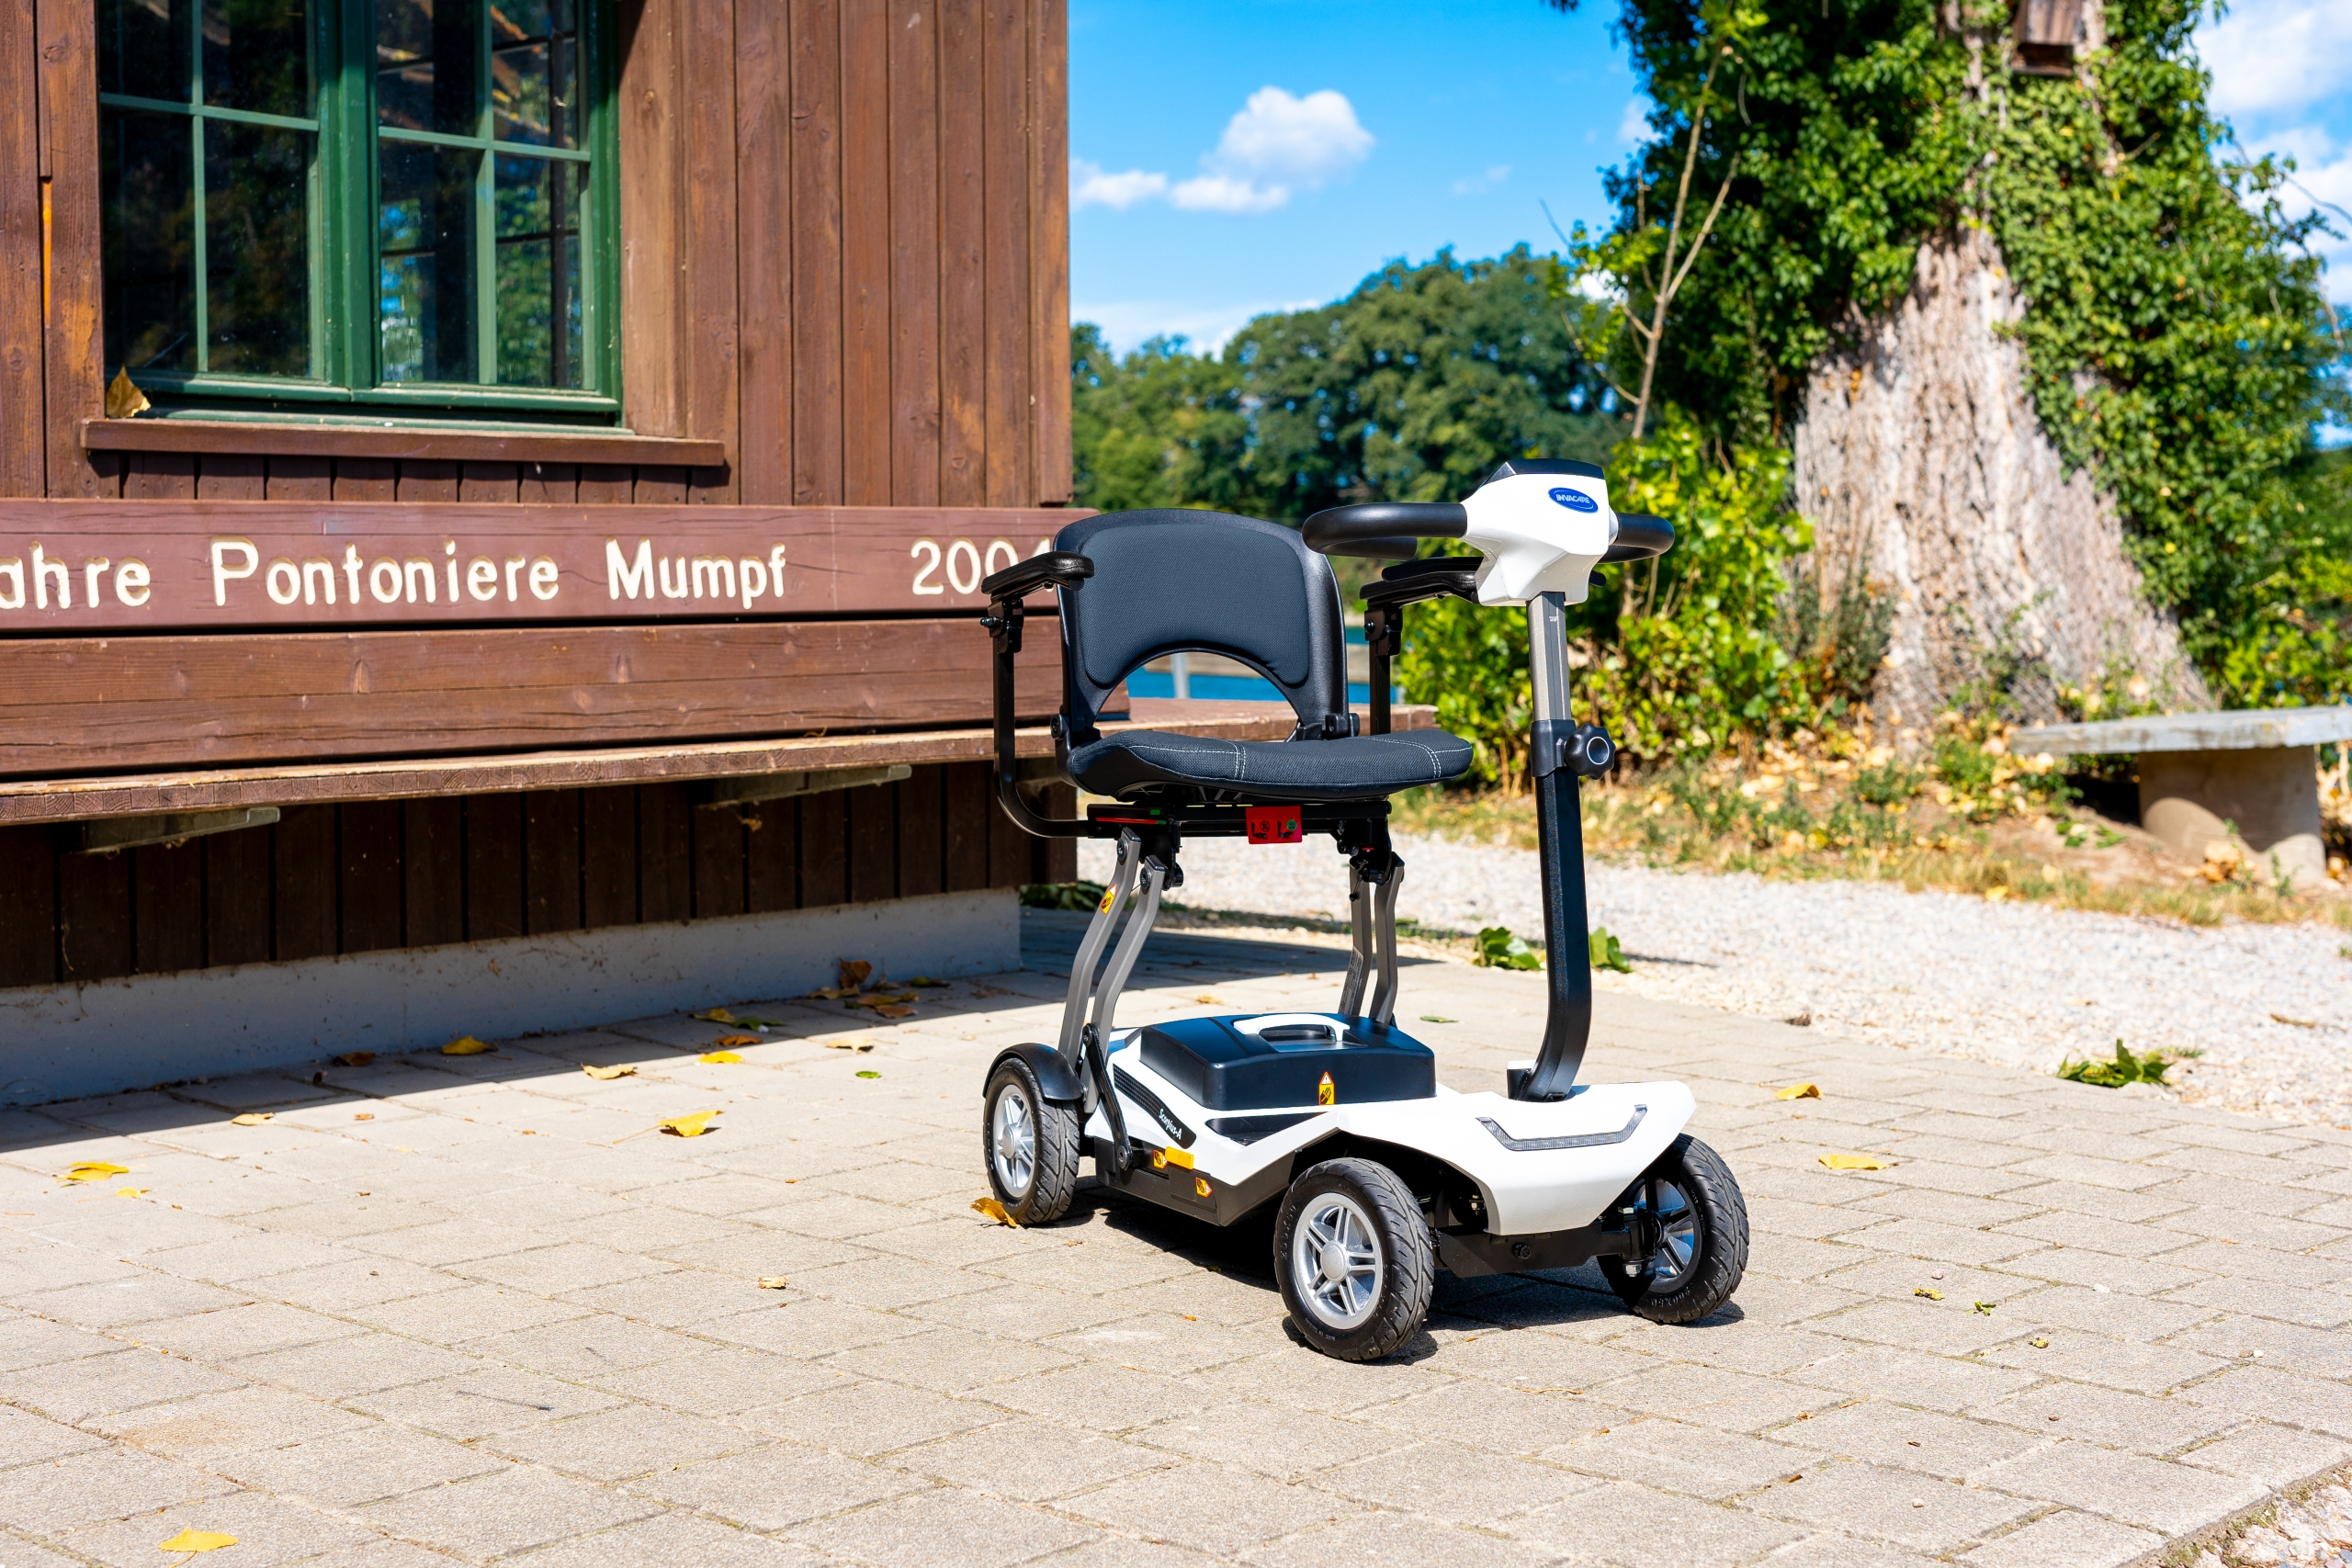 Elektromobil - Scorpius - Jegge bewegr